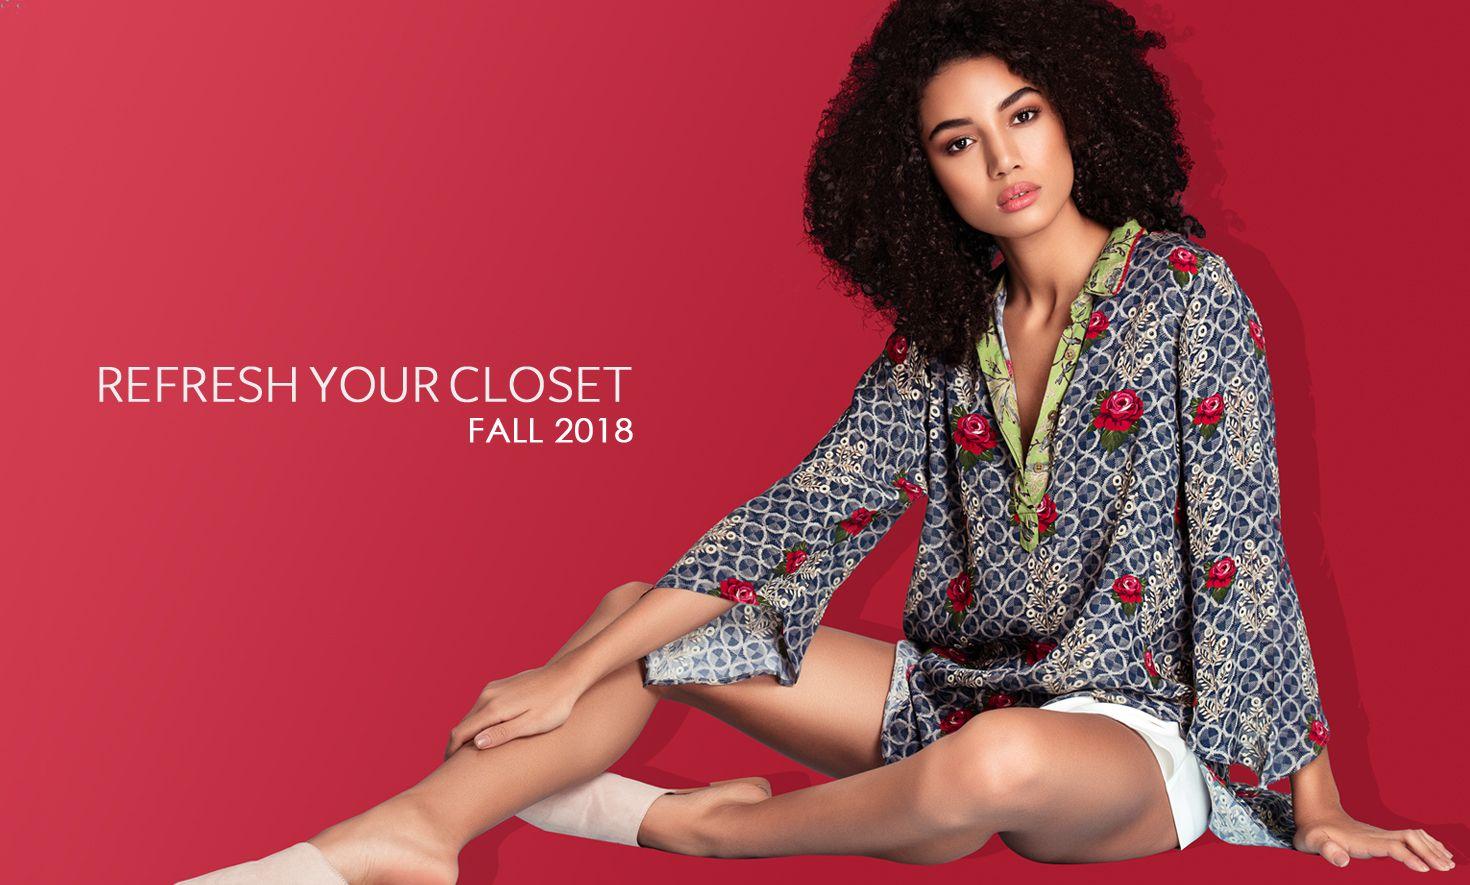 Refresh your closet fall 2018